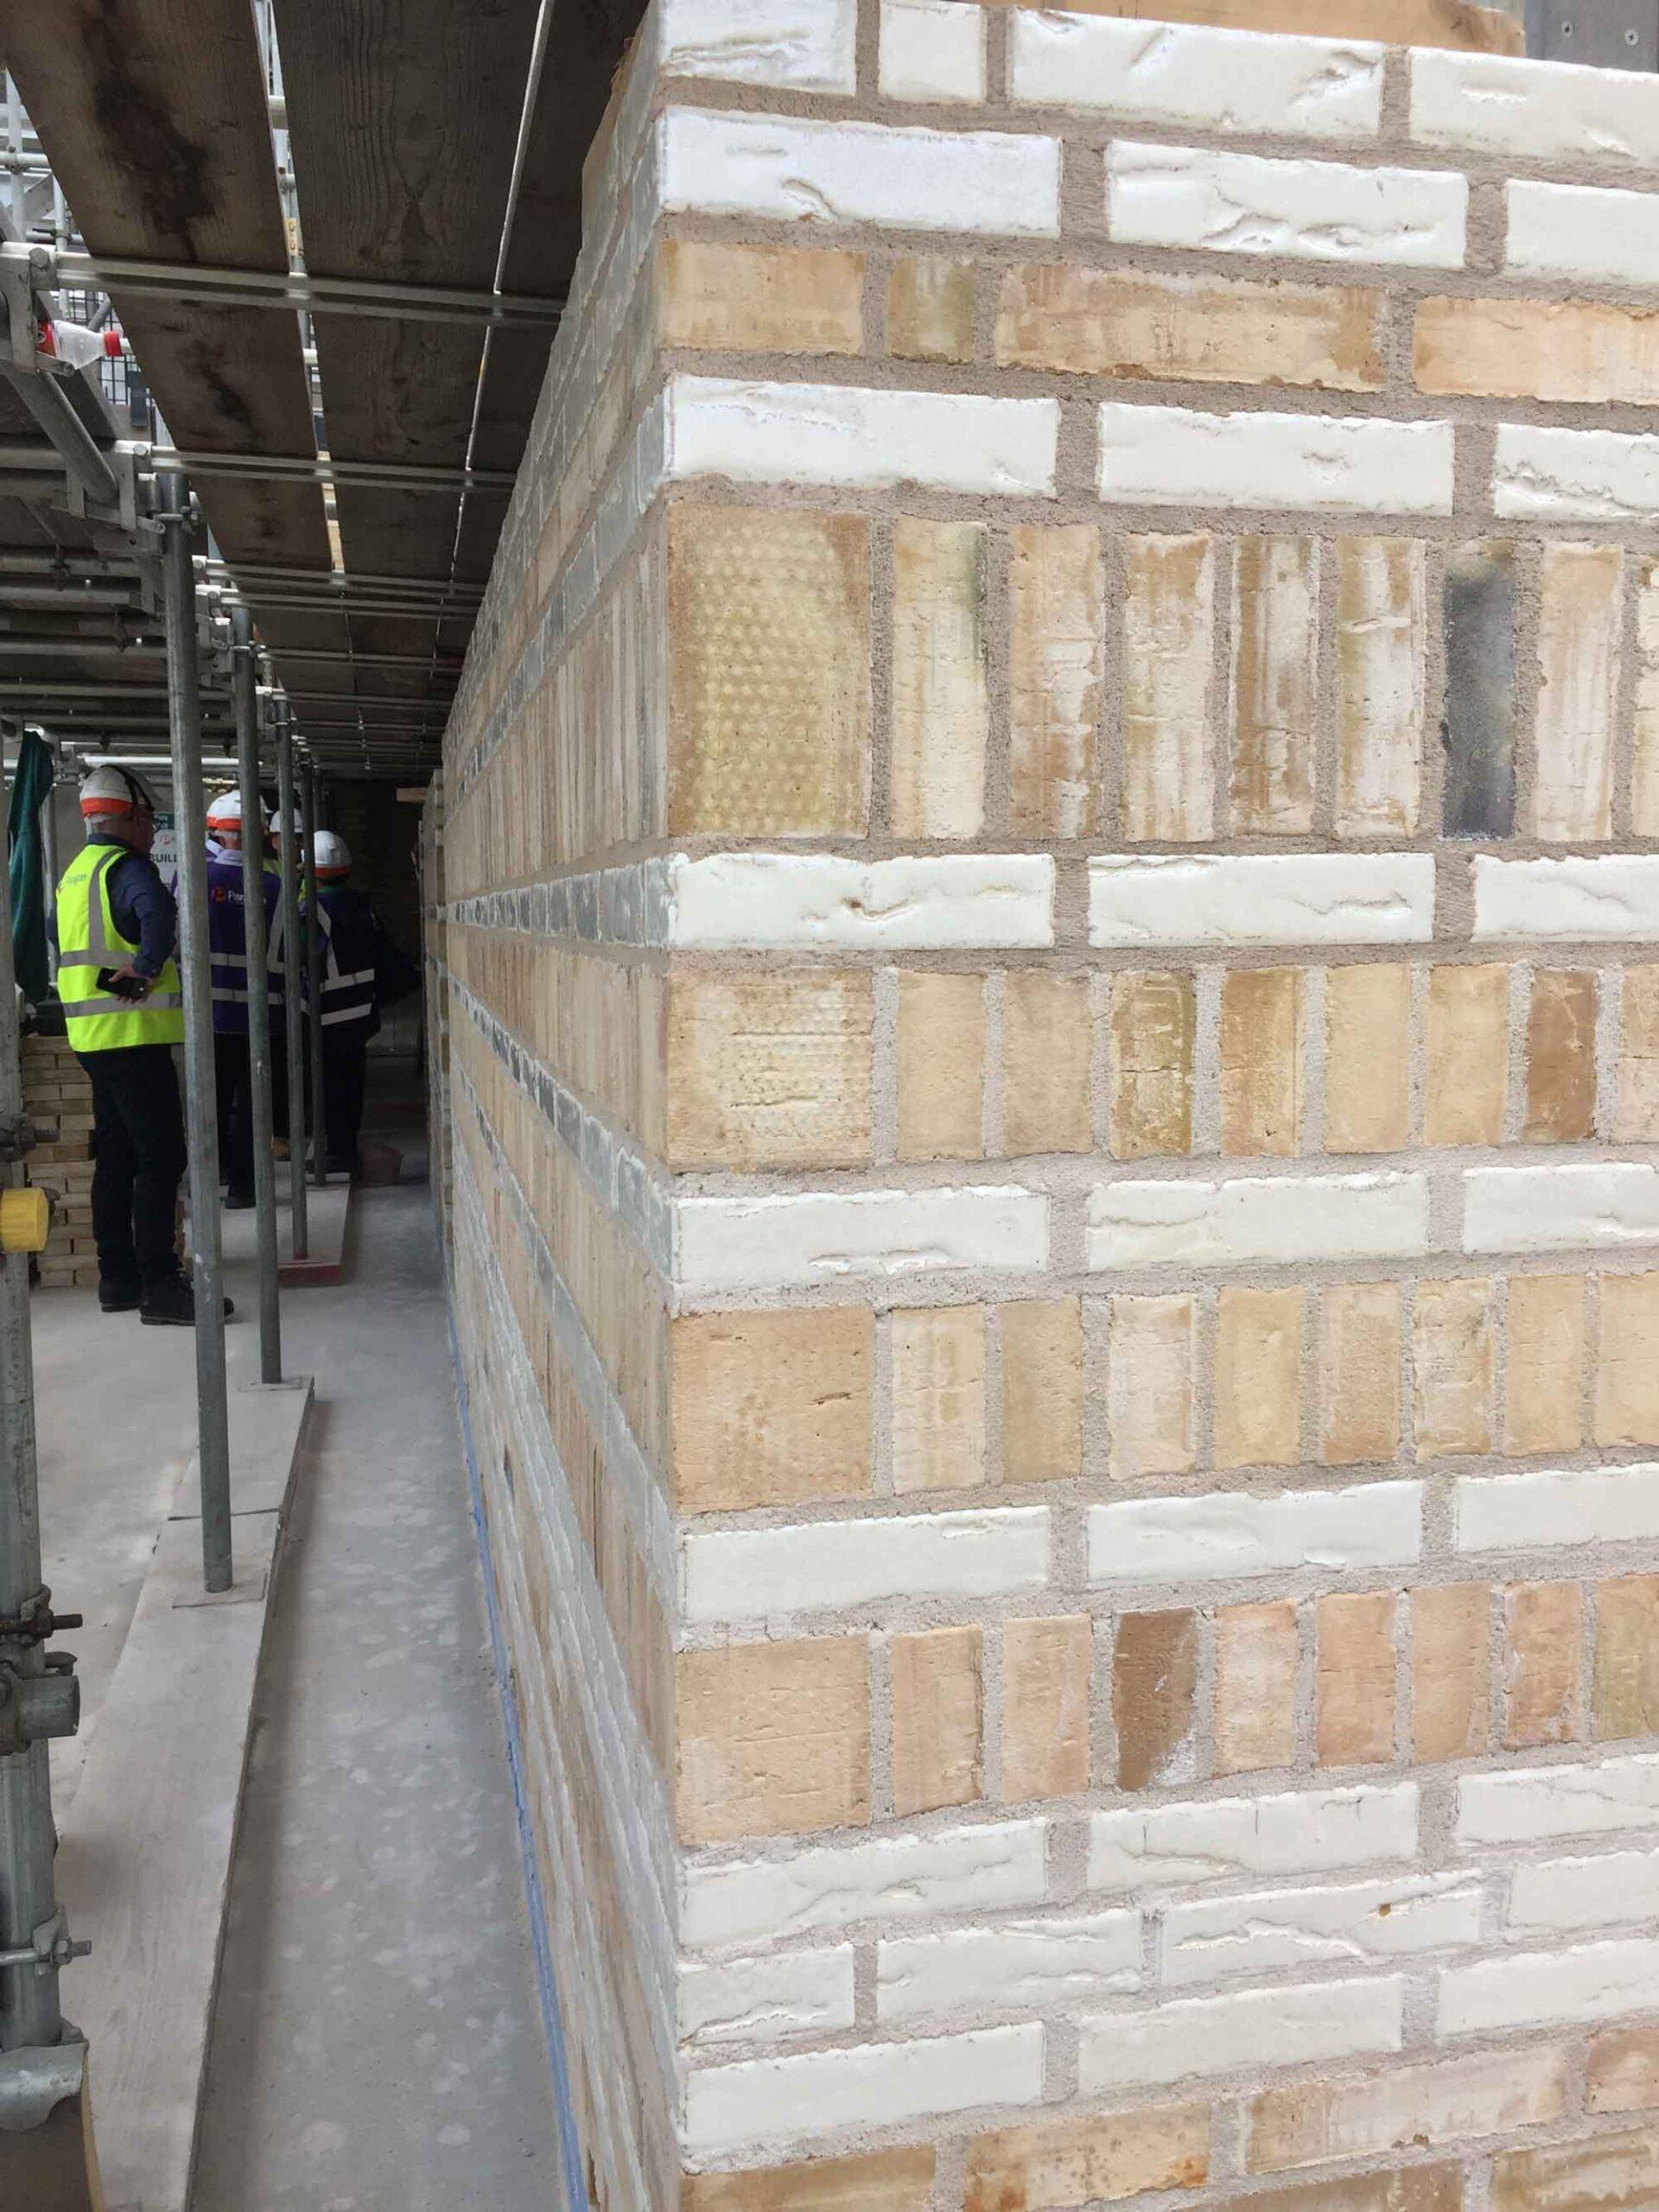 westminster-fire-station-openstudio-brick